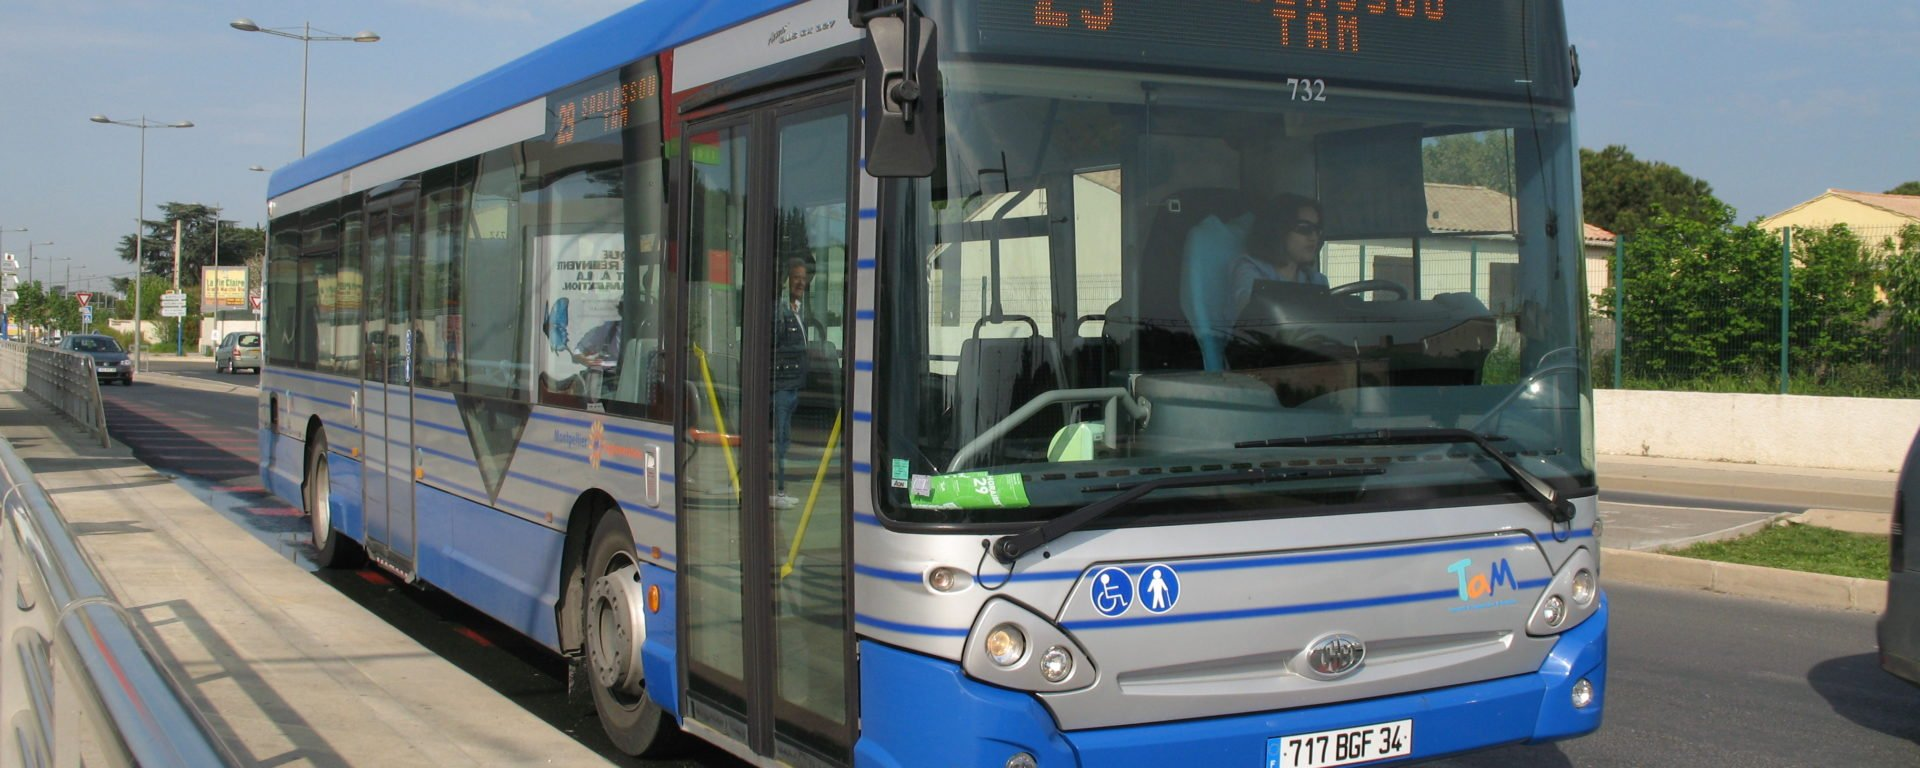 Bus TaM MontpellierTransdev mobility company transport public transit passengers passagers Heuliez GX 327